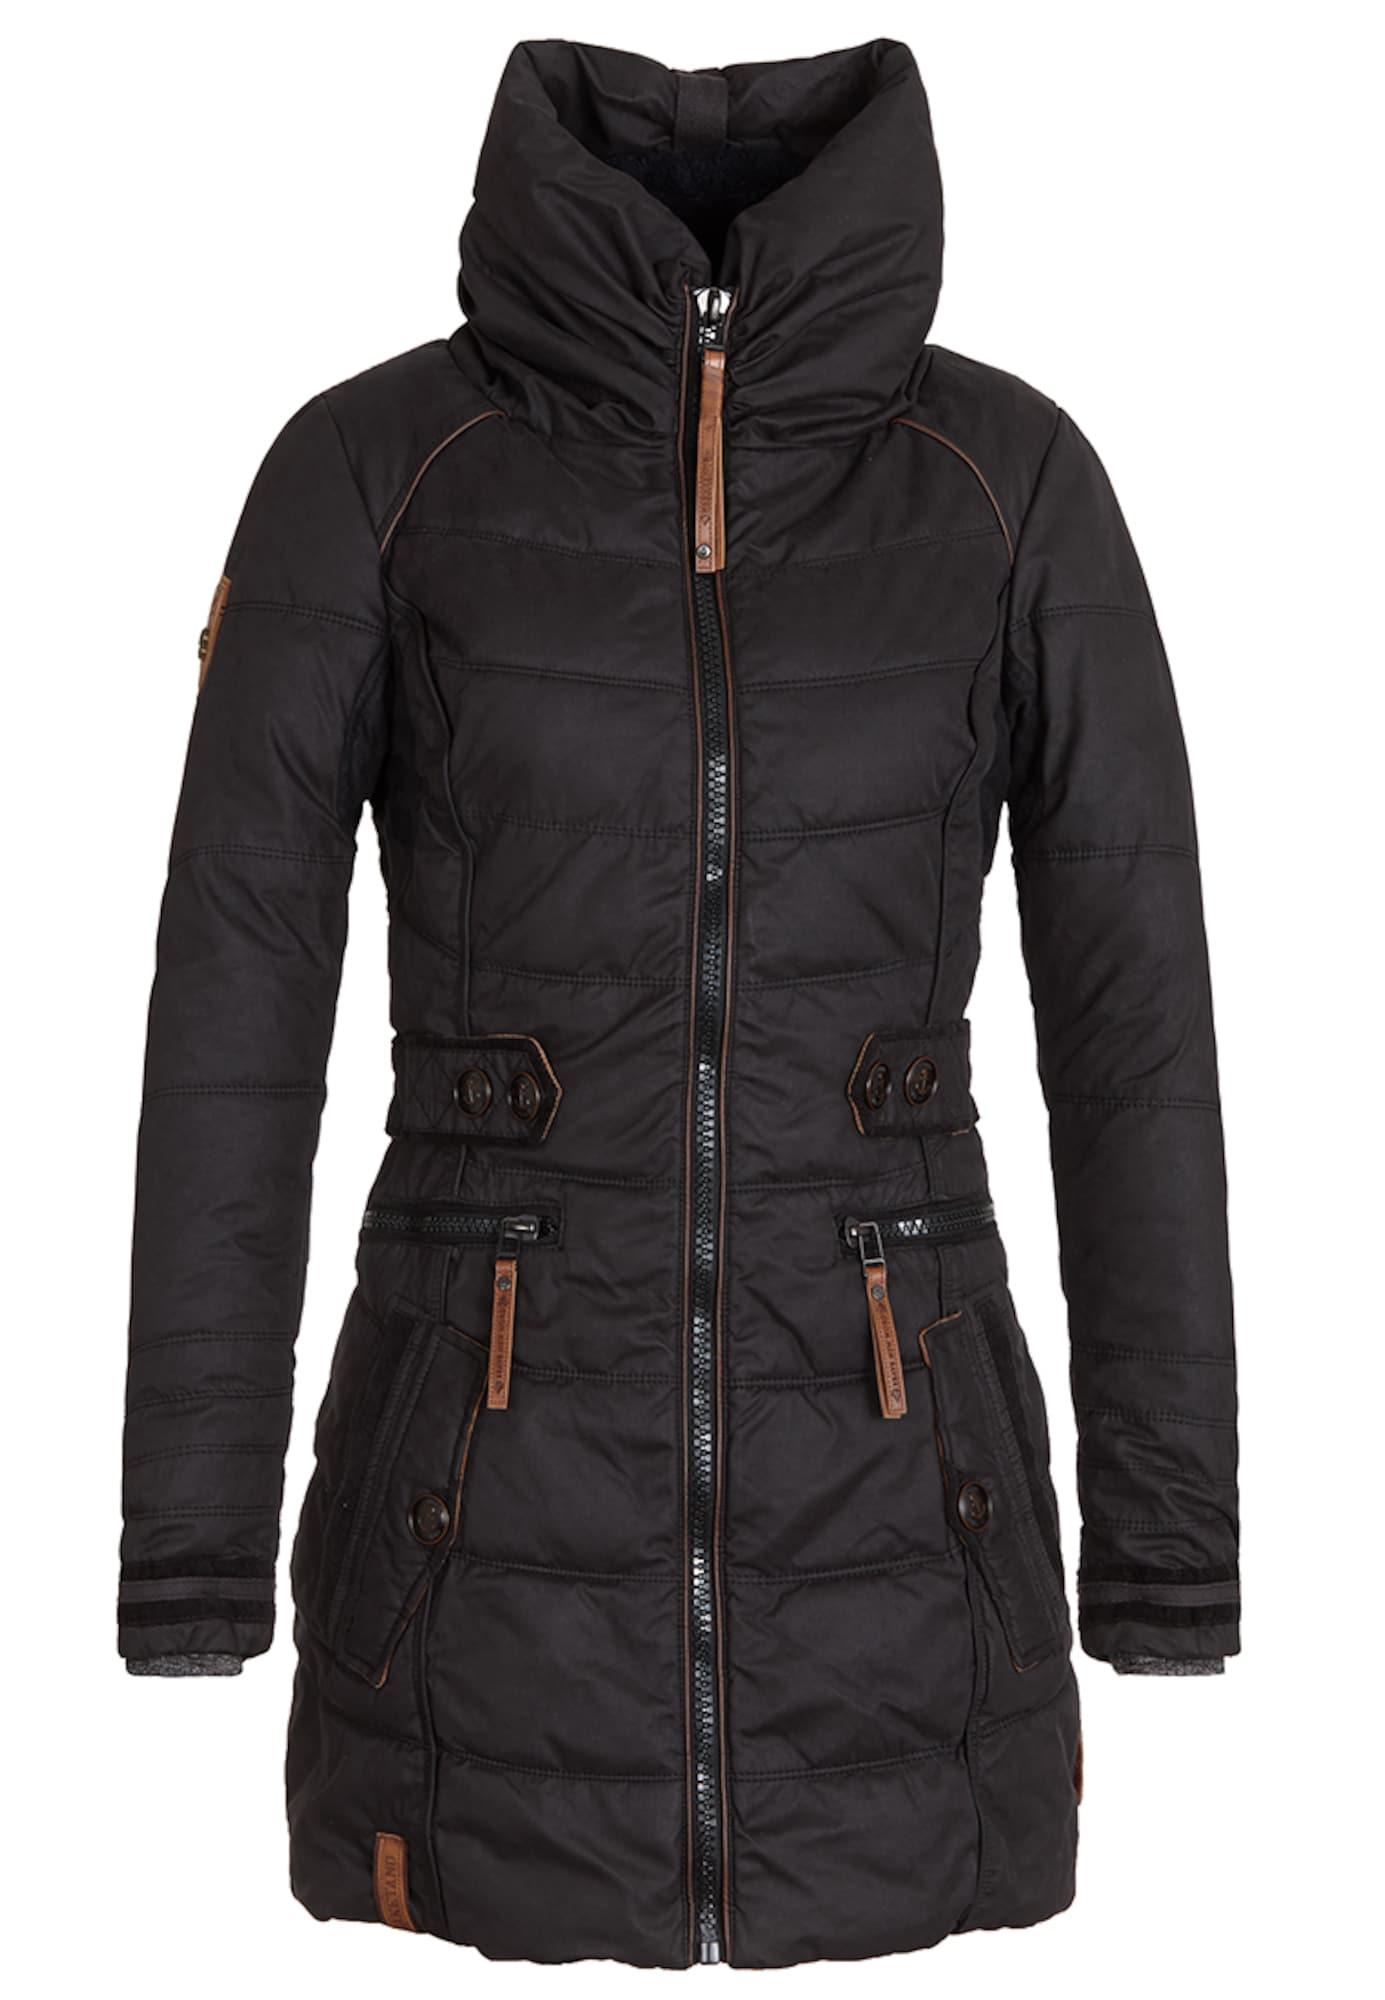 naketano Žieminis paltas 'Knastrologin' šokolado spalva